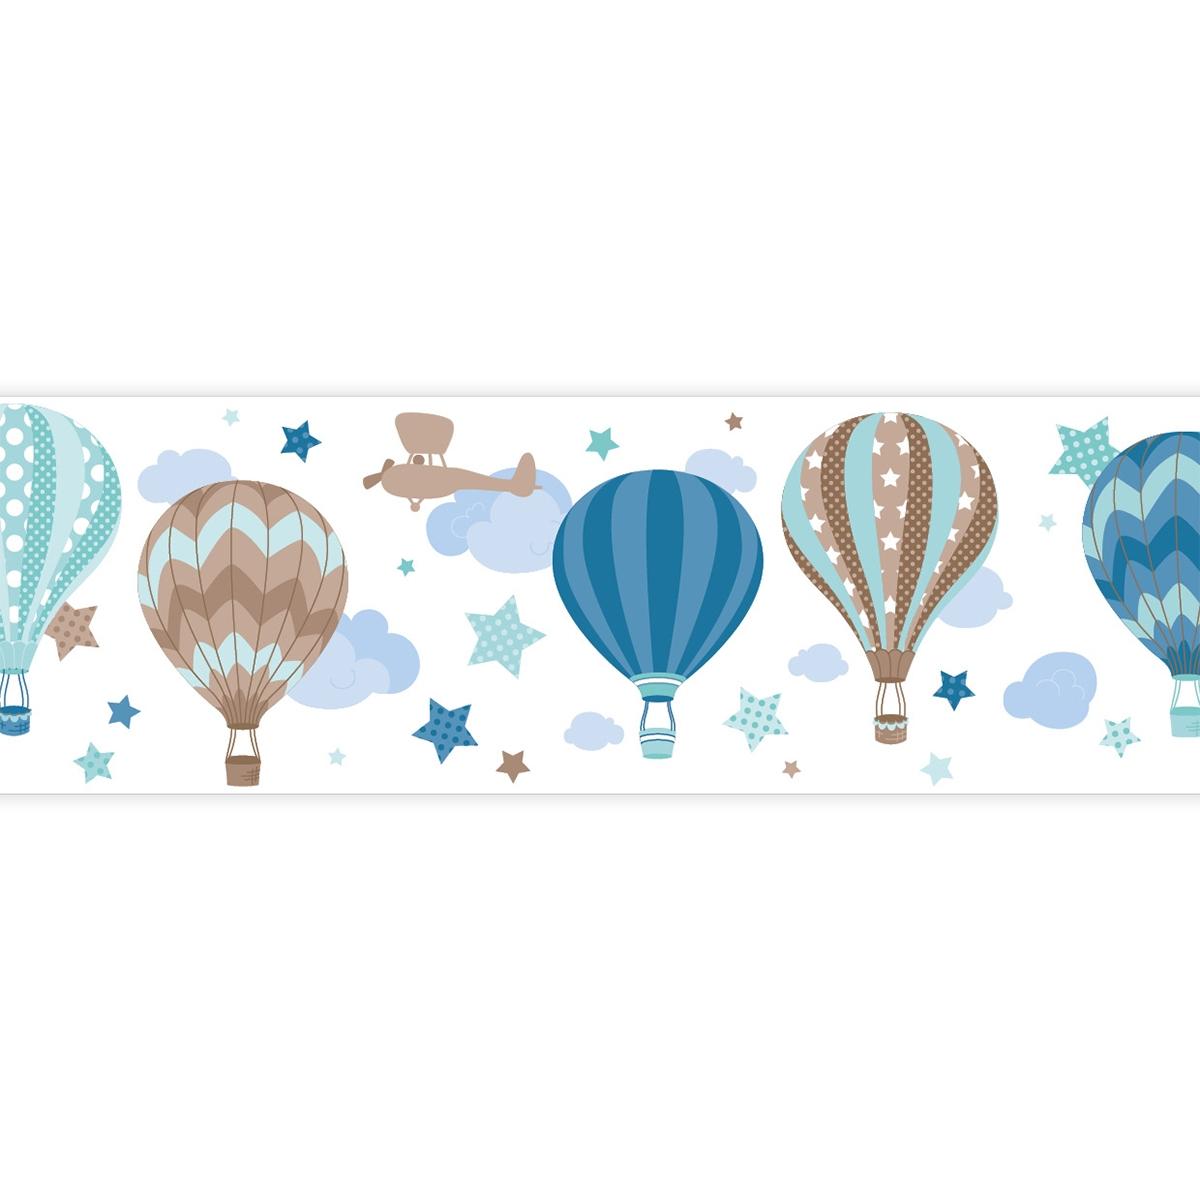 Full Size of Dinki Balloon Bordre Heiluftballons Mint Taupe Sofa Kinderzimmer Regale Regal Weiß Kinderzimmer Bordüren Kinderzimmer